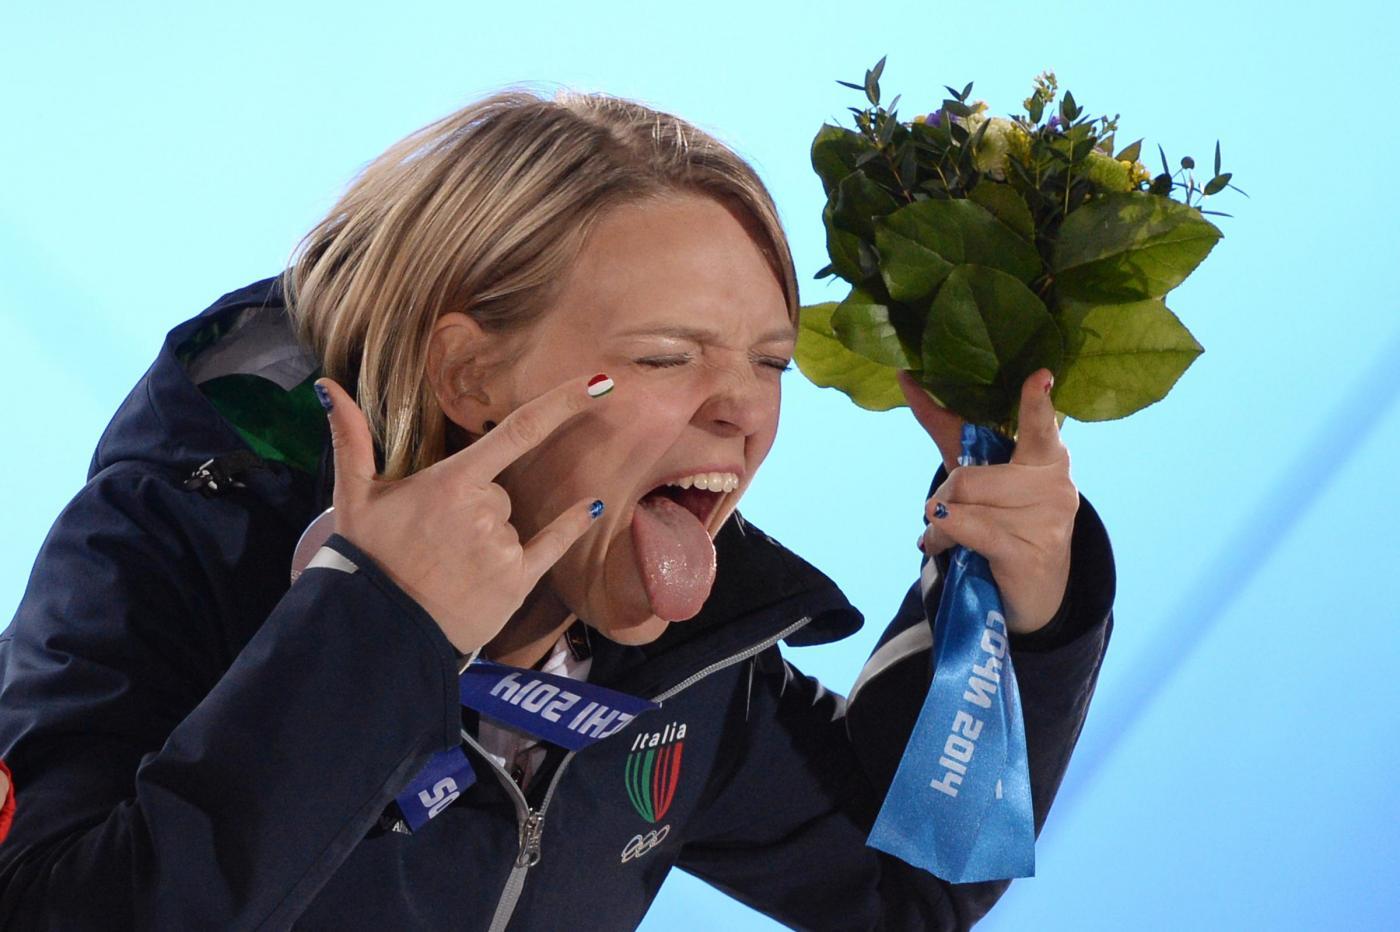 Arianna Fontana Sochi 2014 bronzo short track 1500 metri